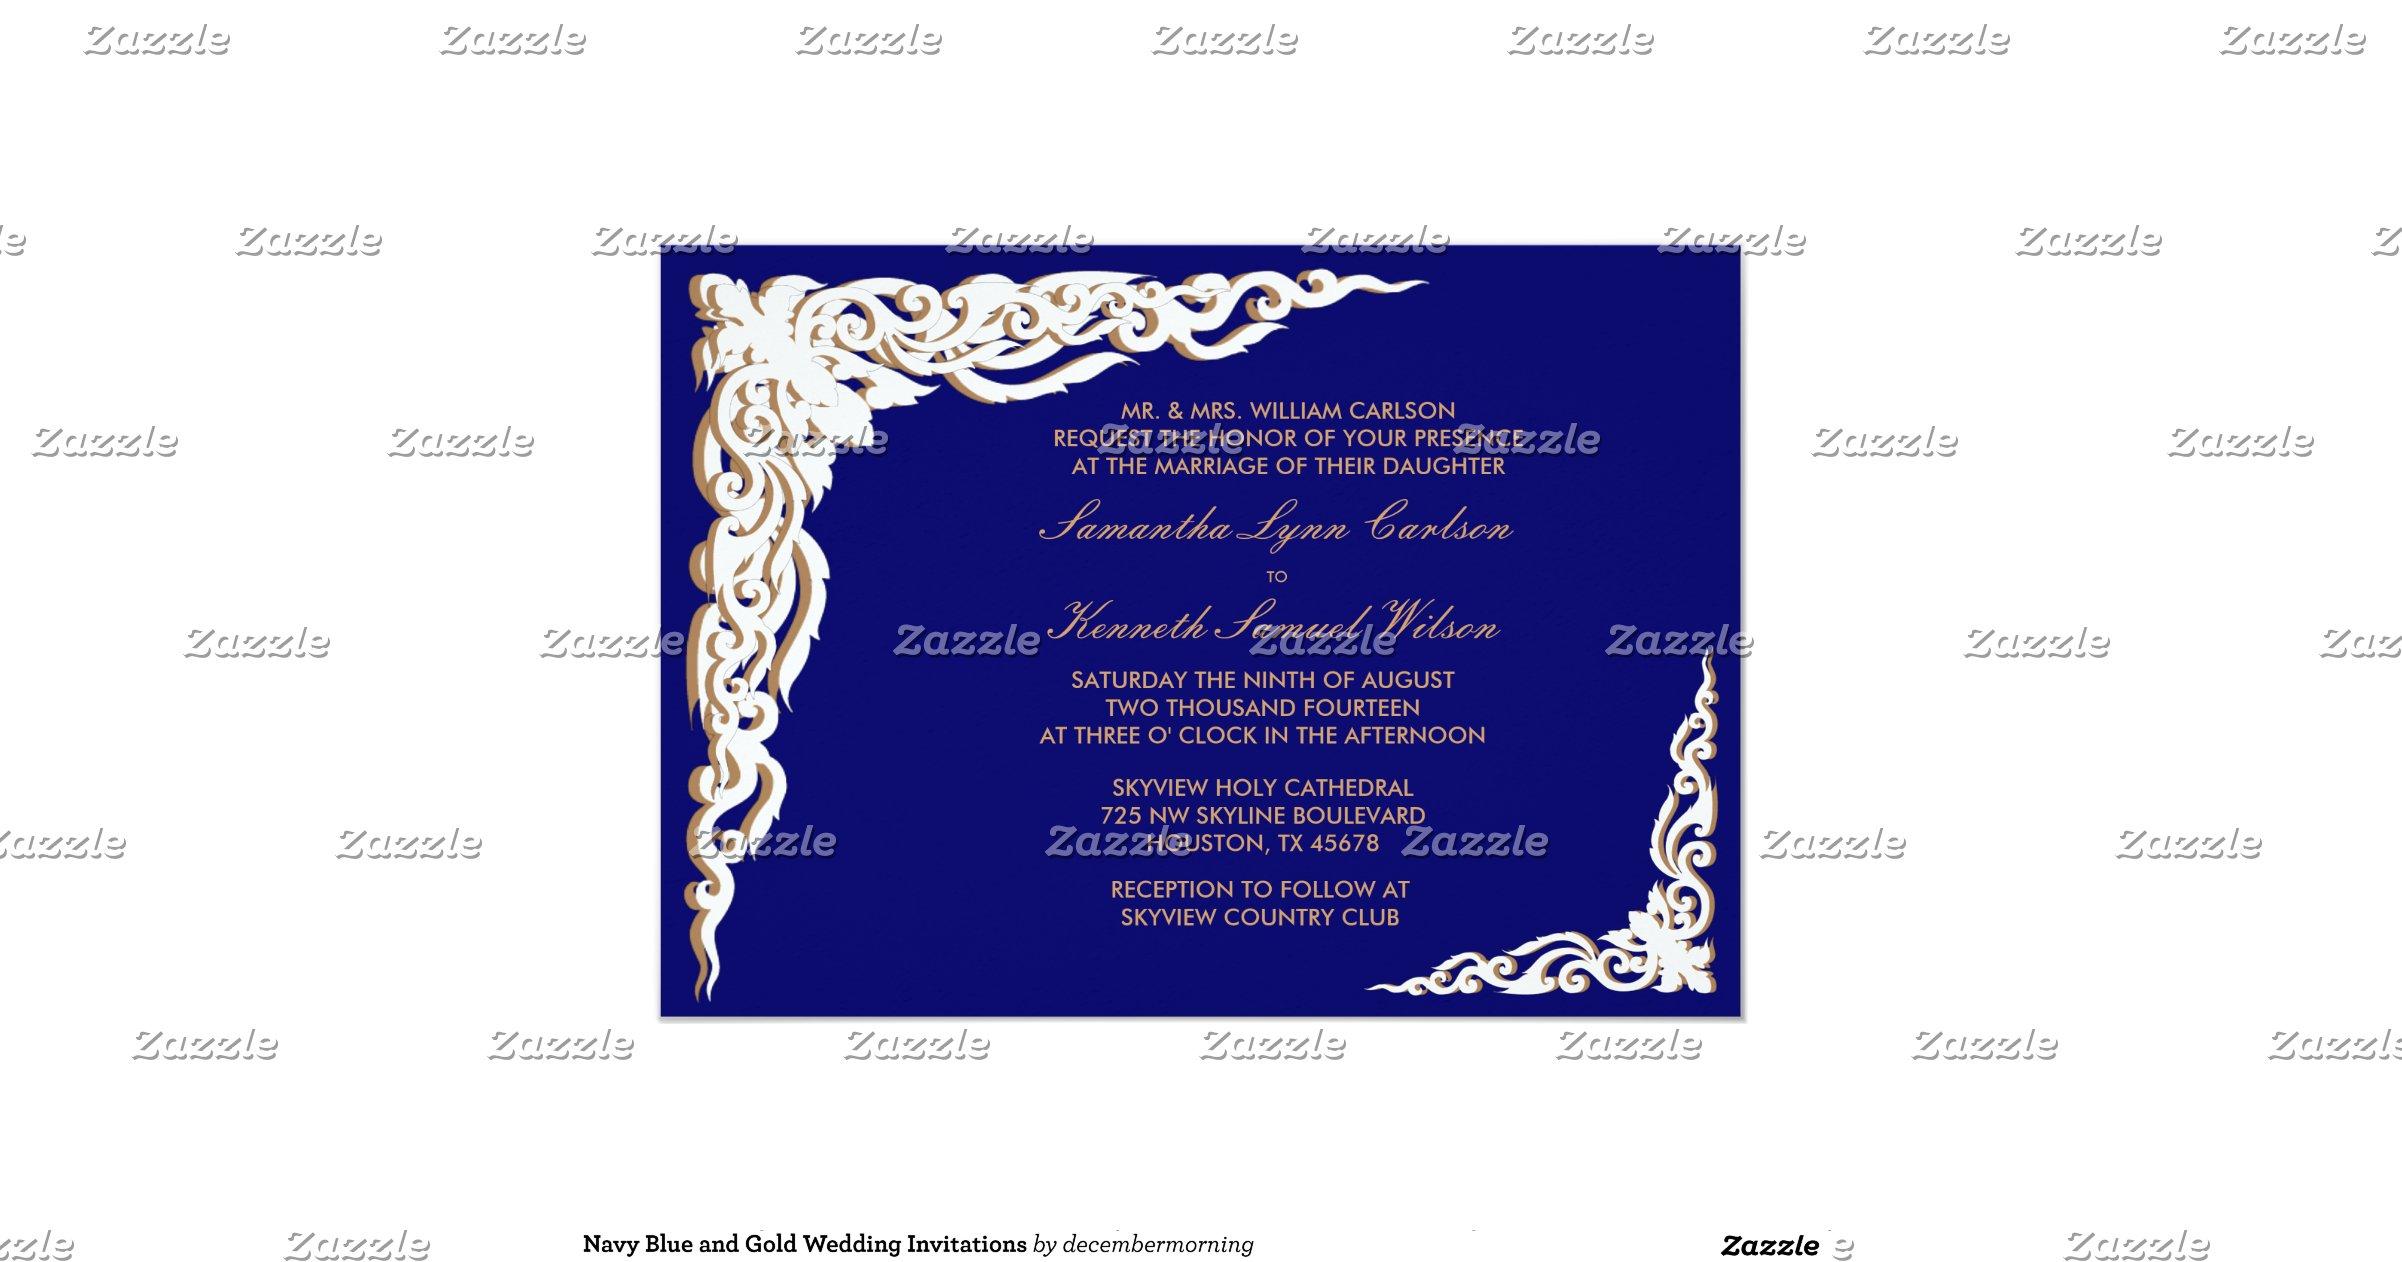 Navy Blue And Gold Wedding Invitations: Navy_blue_and_gold_wedding_invitations